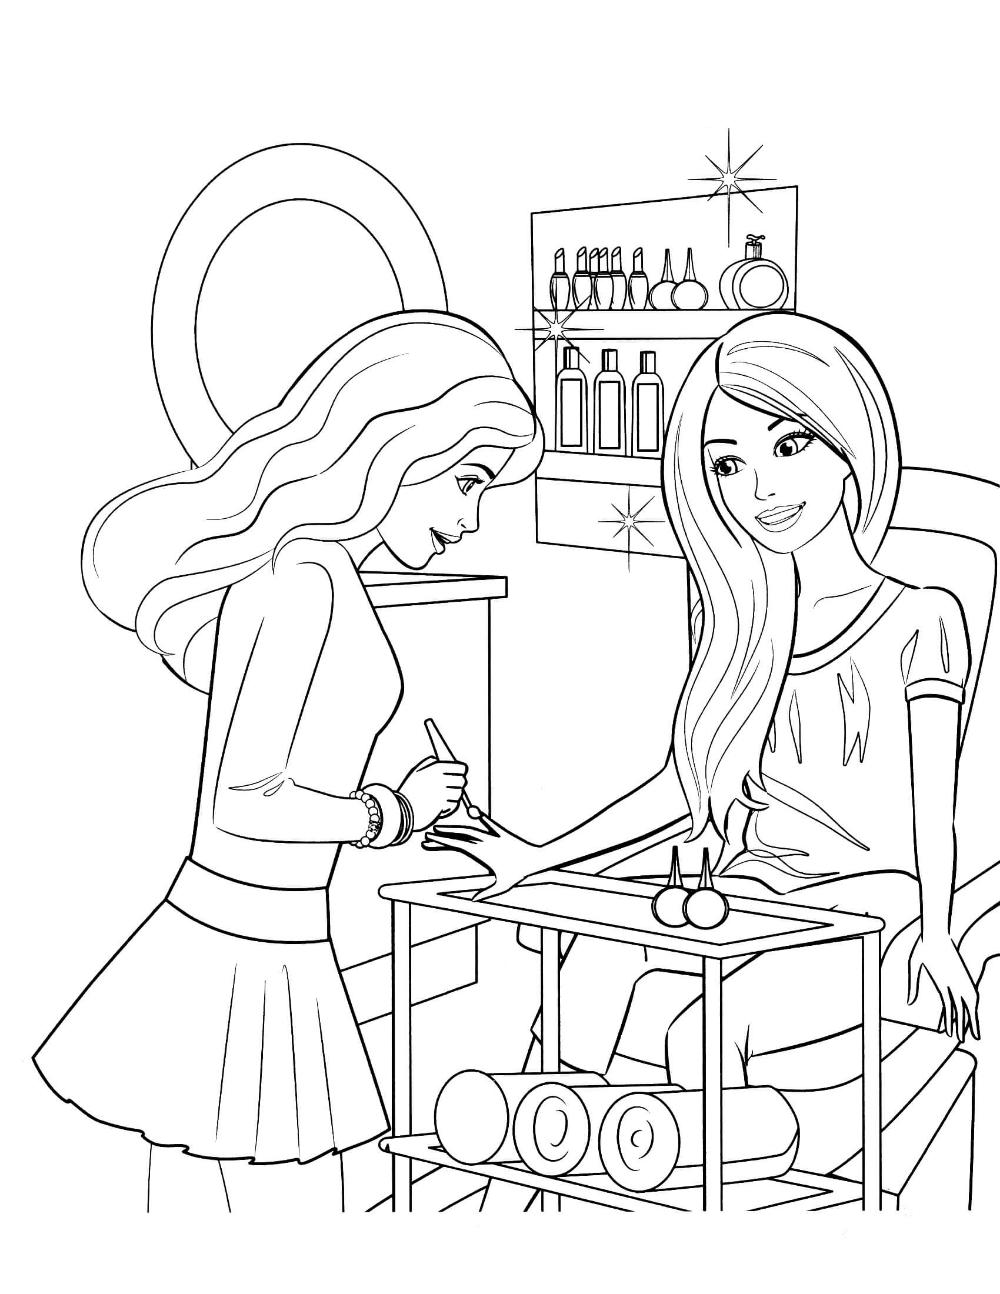 باربي تلوين بحث Google Barbie Coloring Pages Barbie Drawing Barbie Coloring